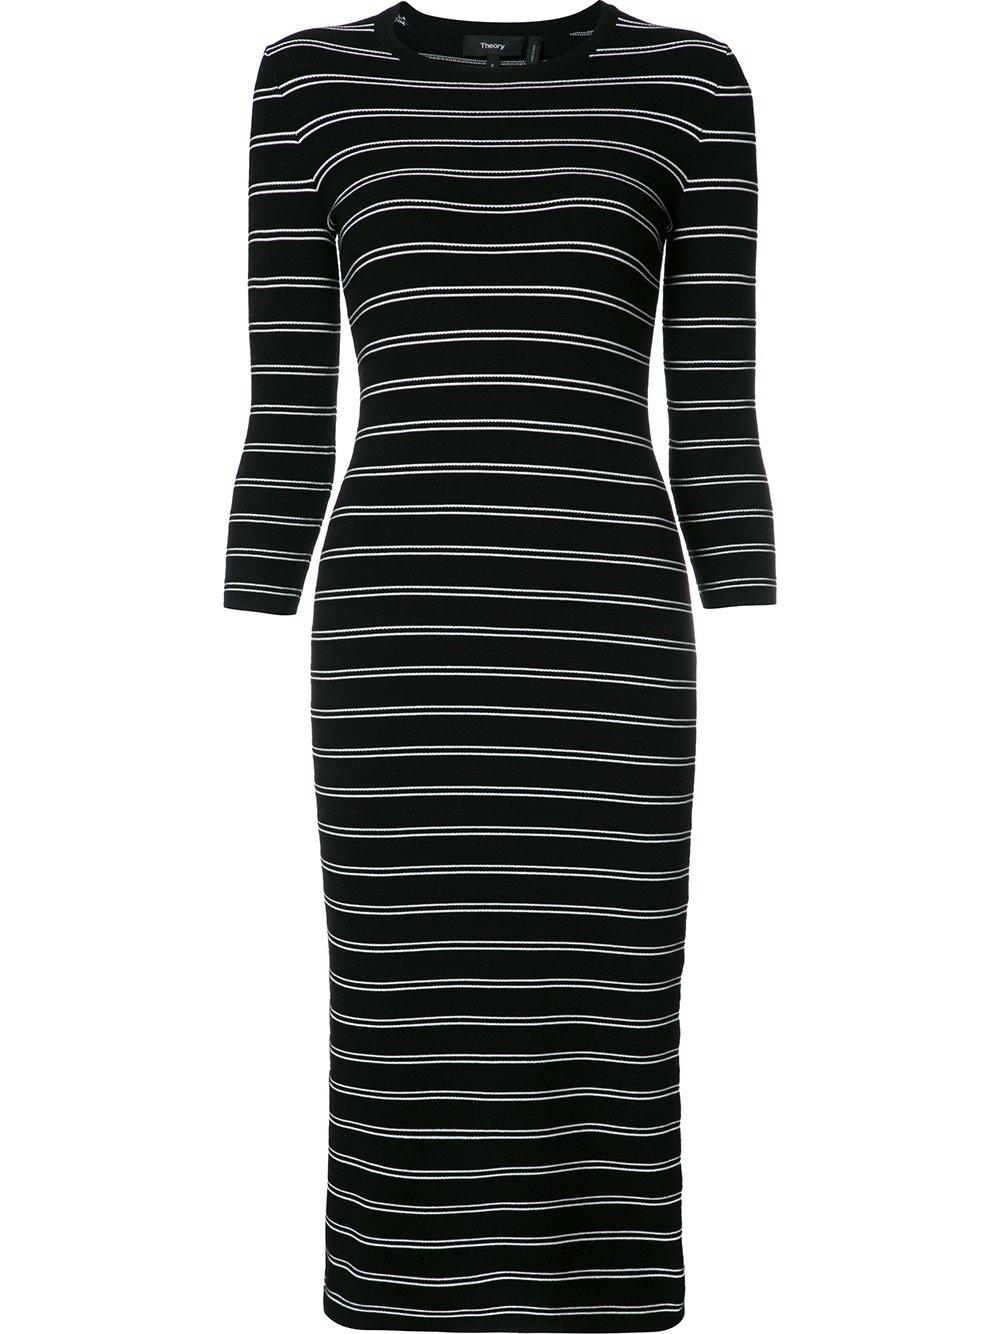 THEORY dress.jpg